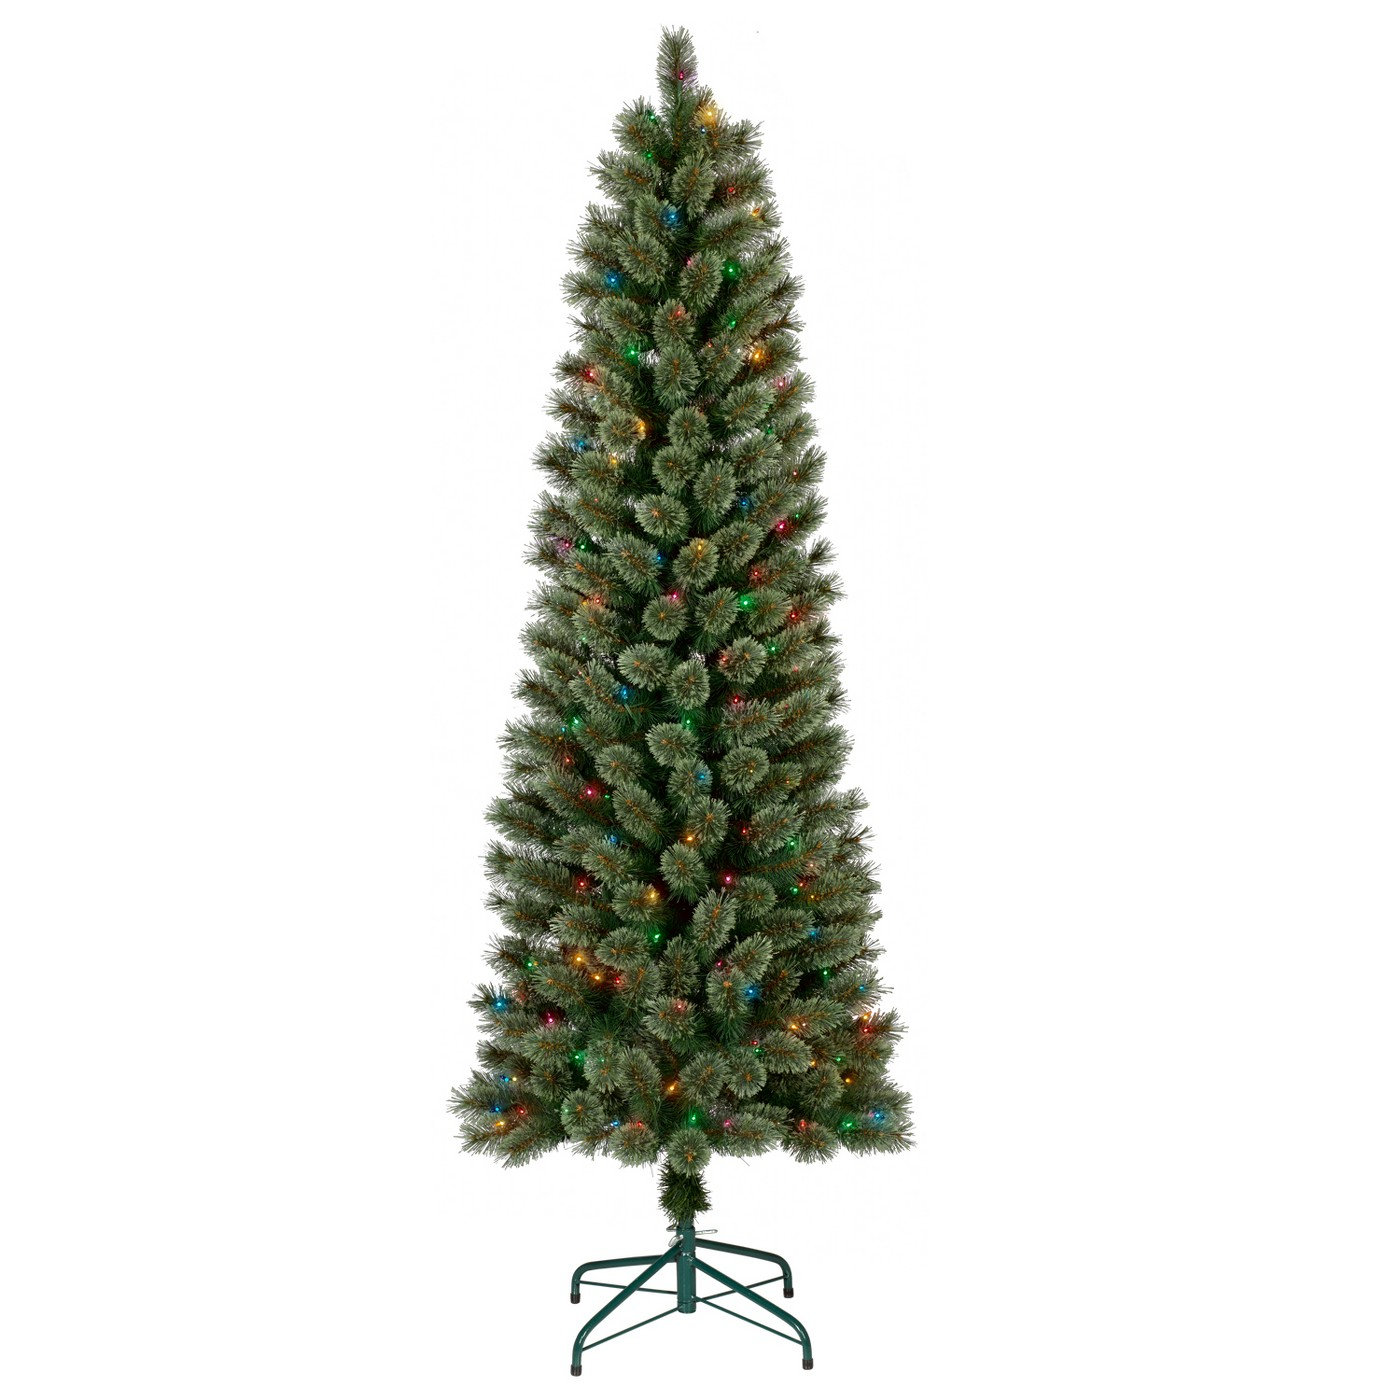 6ft Prelit Artificial Christmas Tree Slim Virginia Pine Multi Lights - Wondershop™ - image 1 of 3